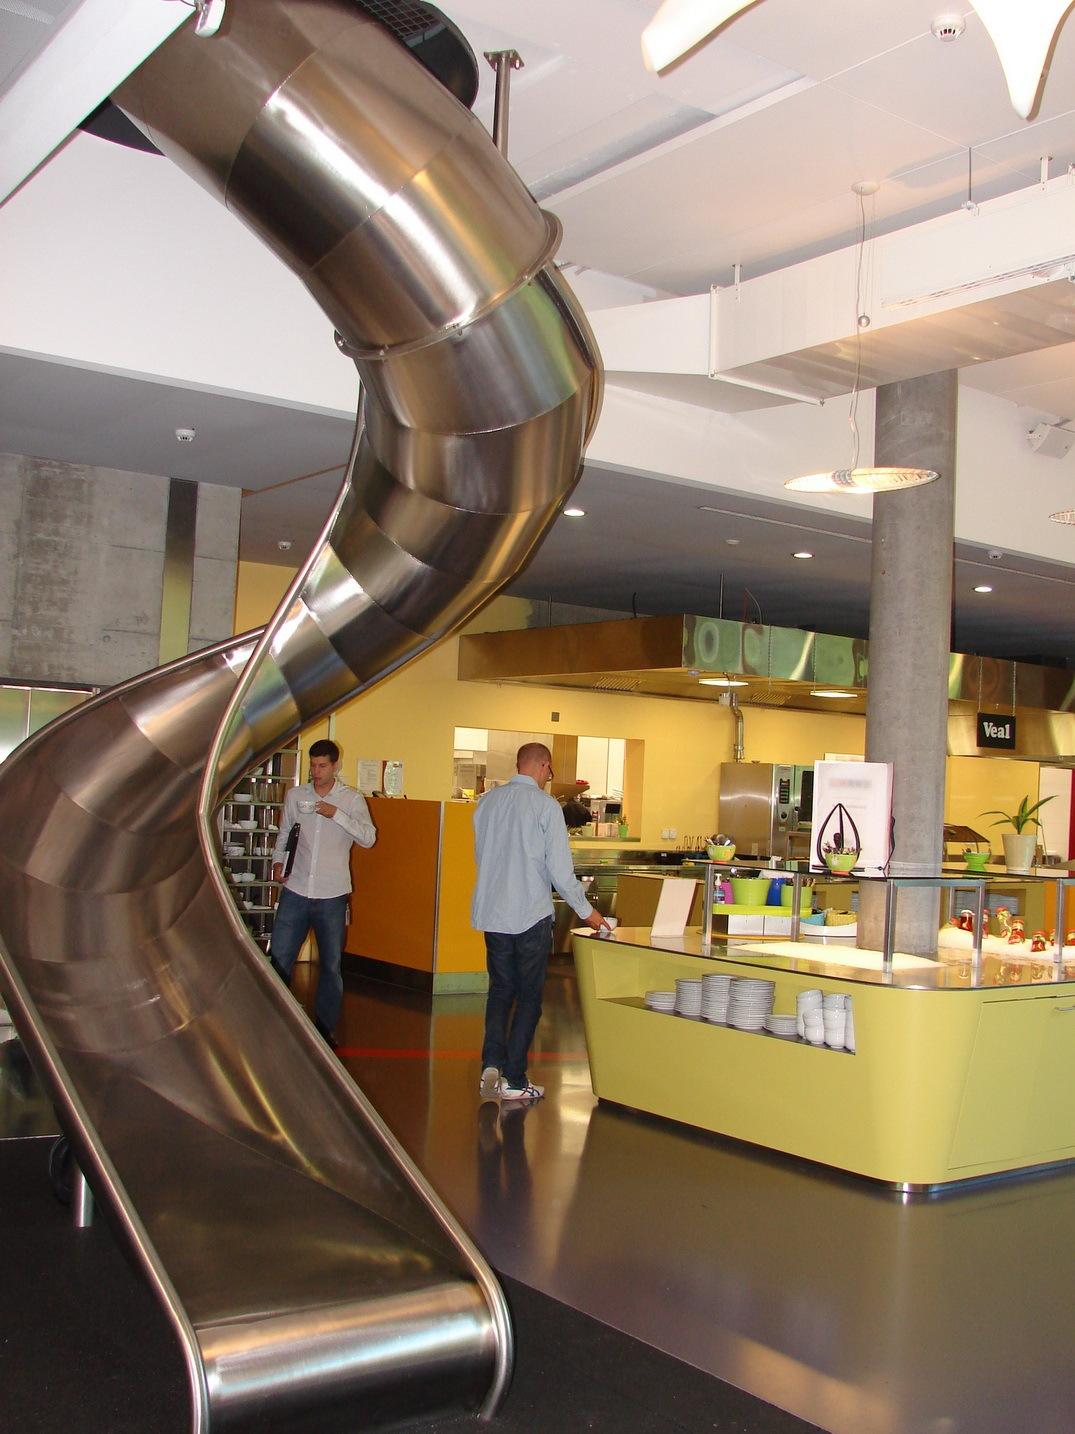 Google Zurich's slide-cafeteria. Image via Yale Computer Science.